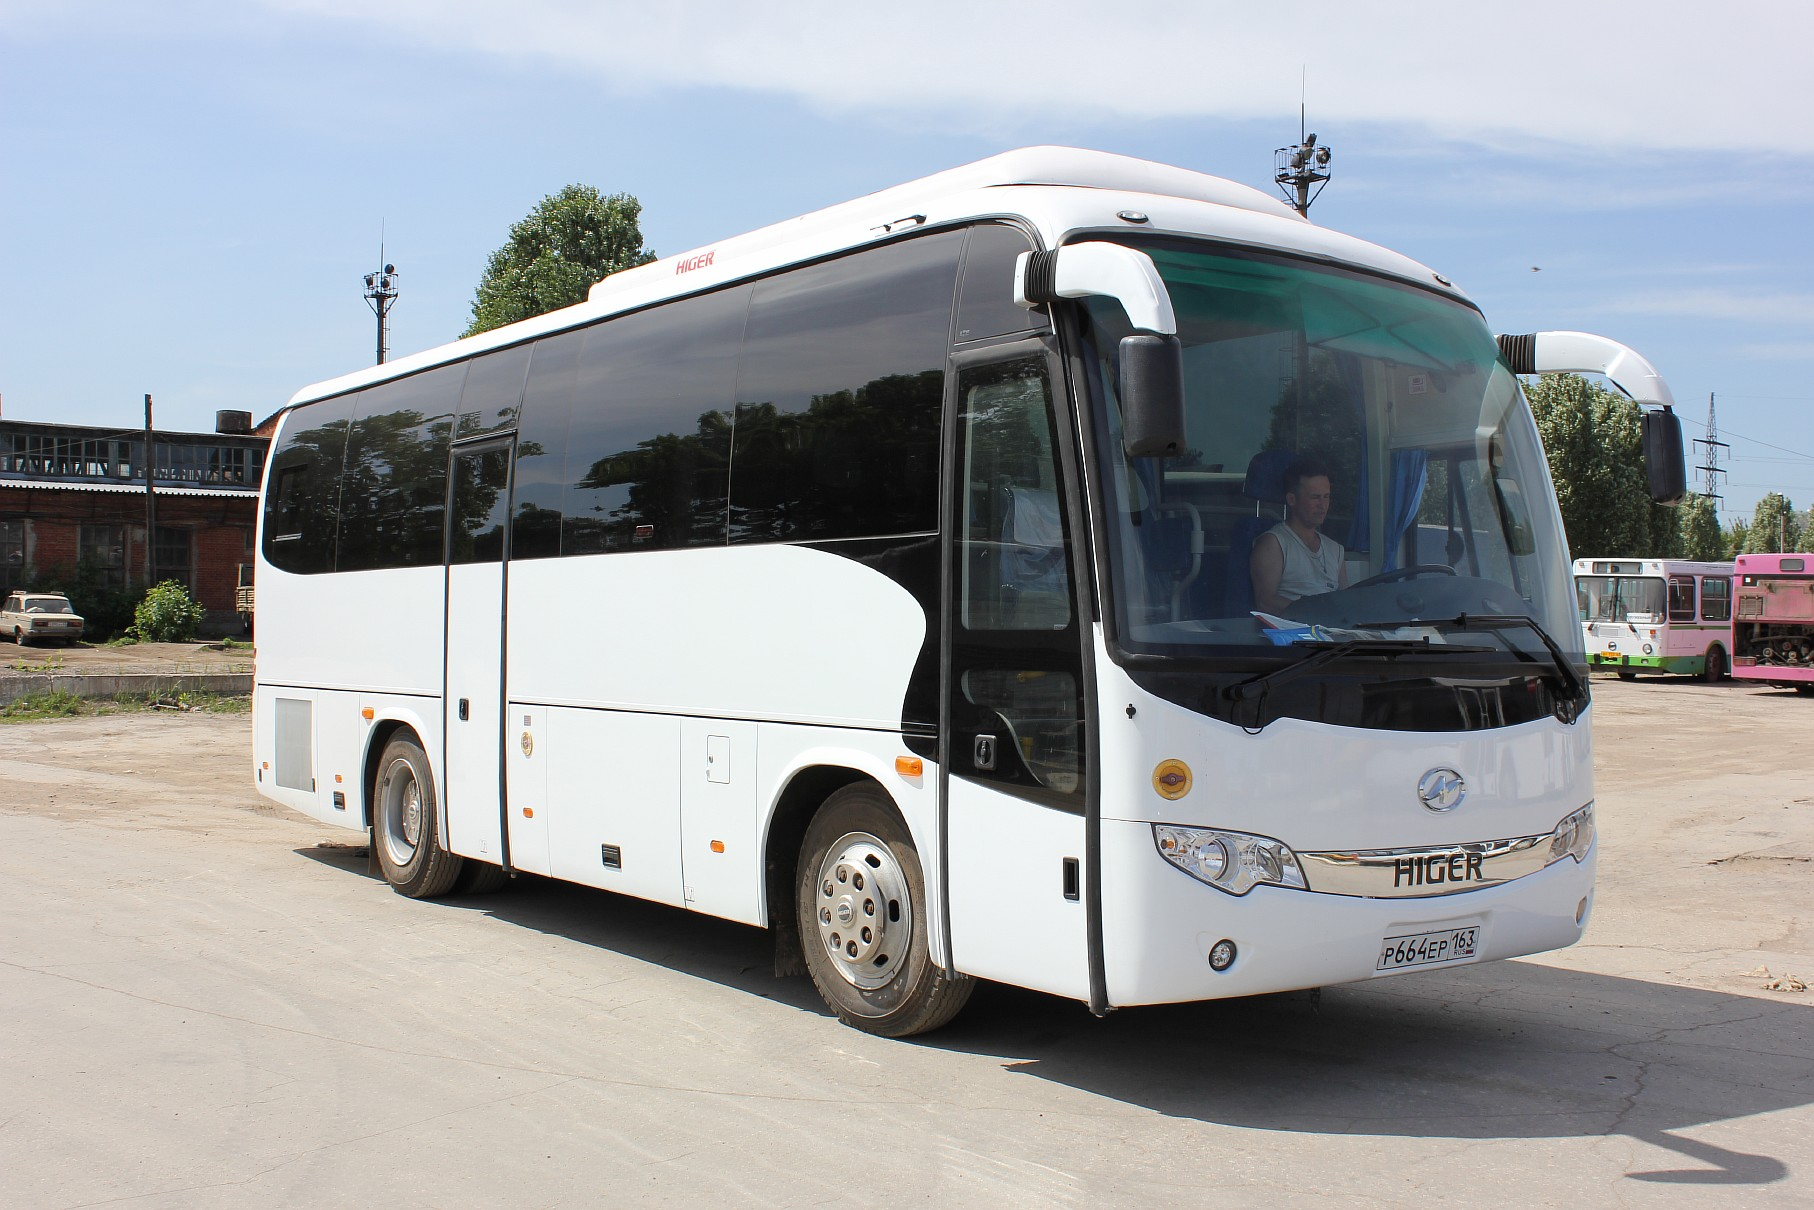 Аренда автобуса HIGER. HIGER аренда в Самаре.